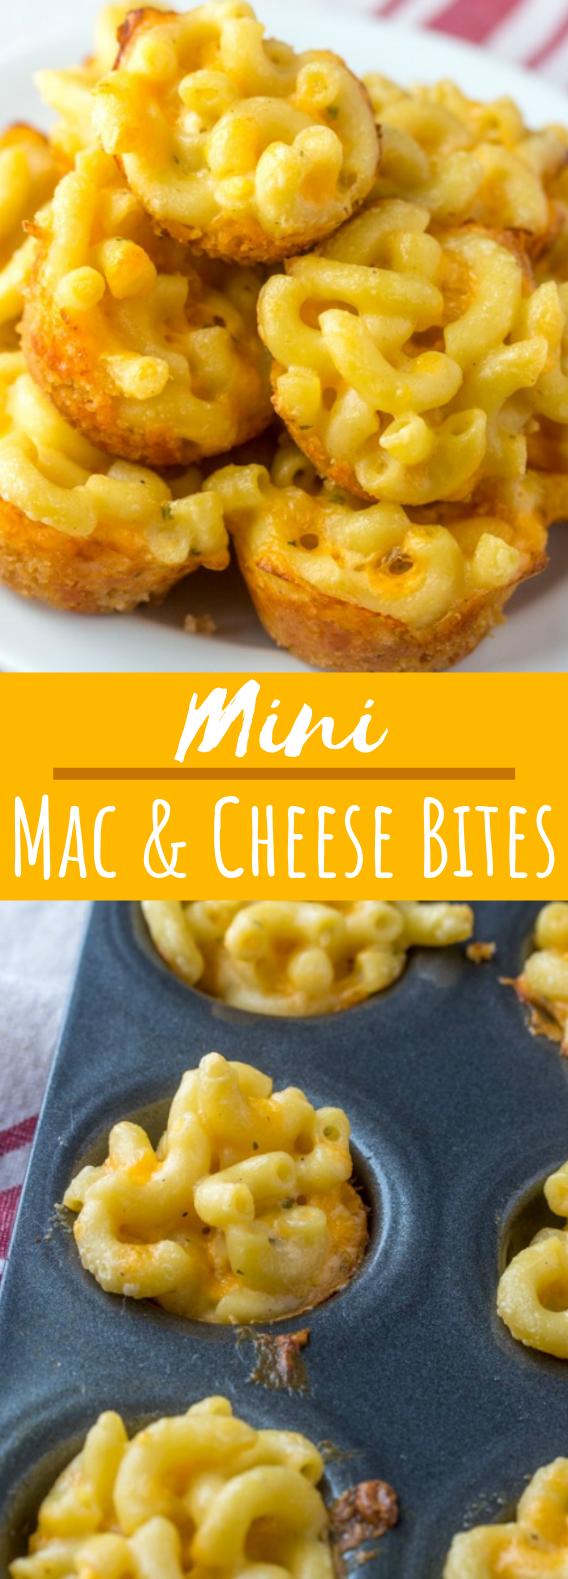 Mini Macaroni and Cheese Bites #appetizers #snacks